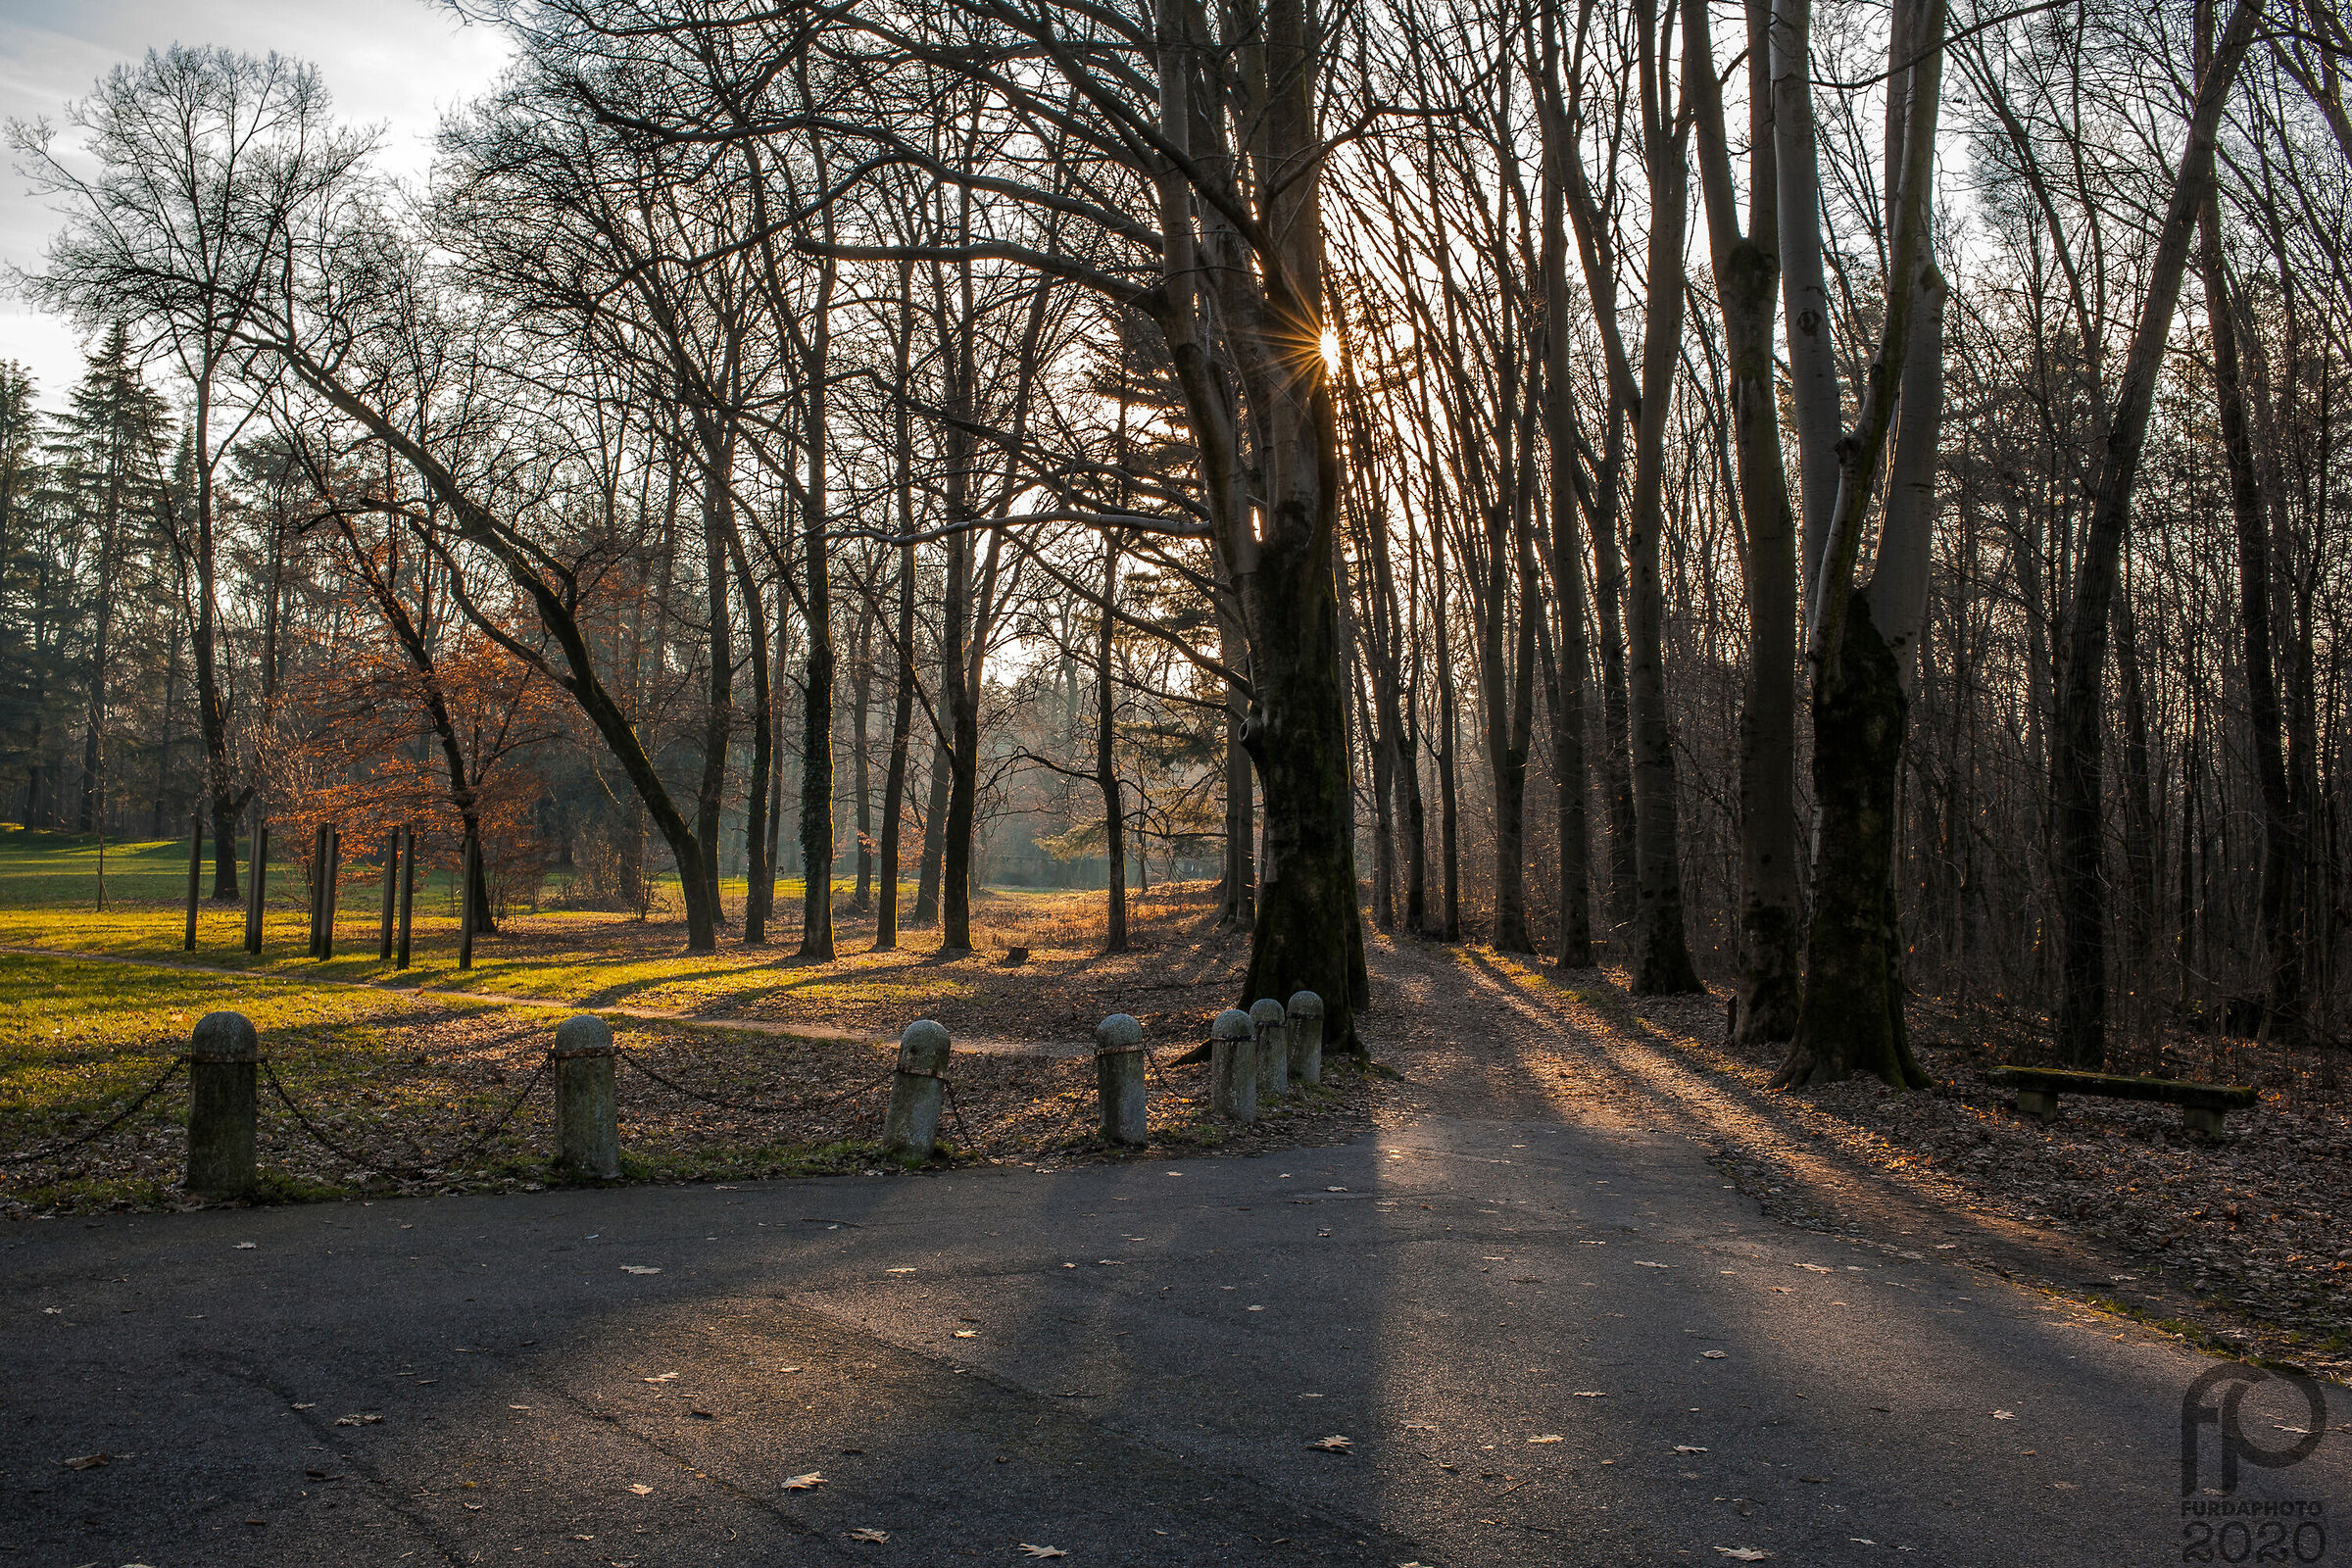 Parco di Monza - Gennaio 2020...